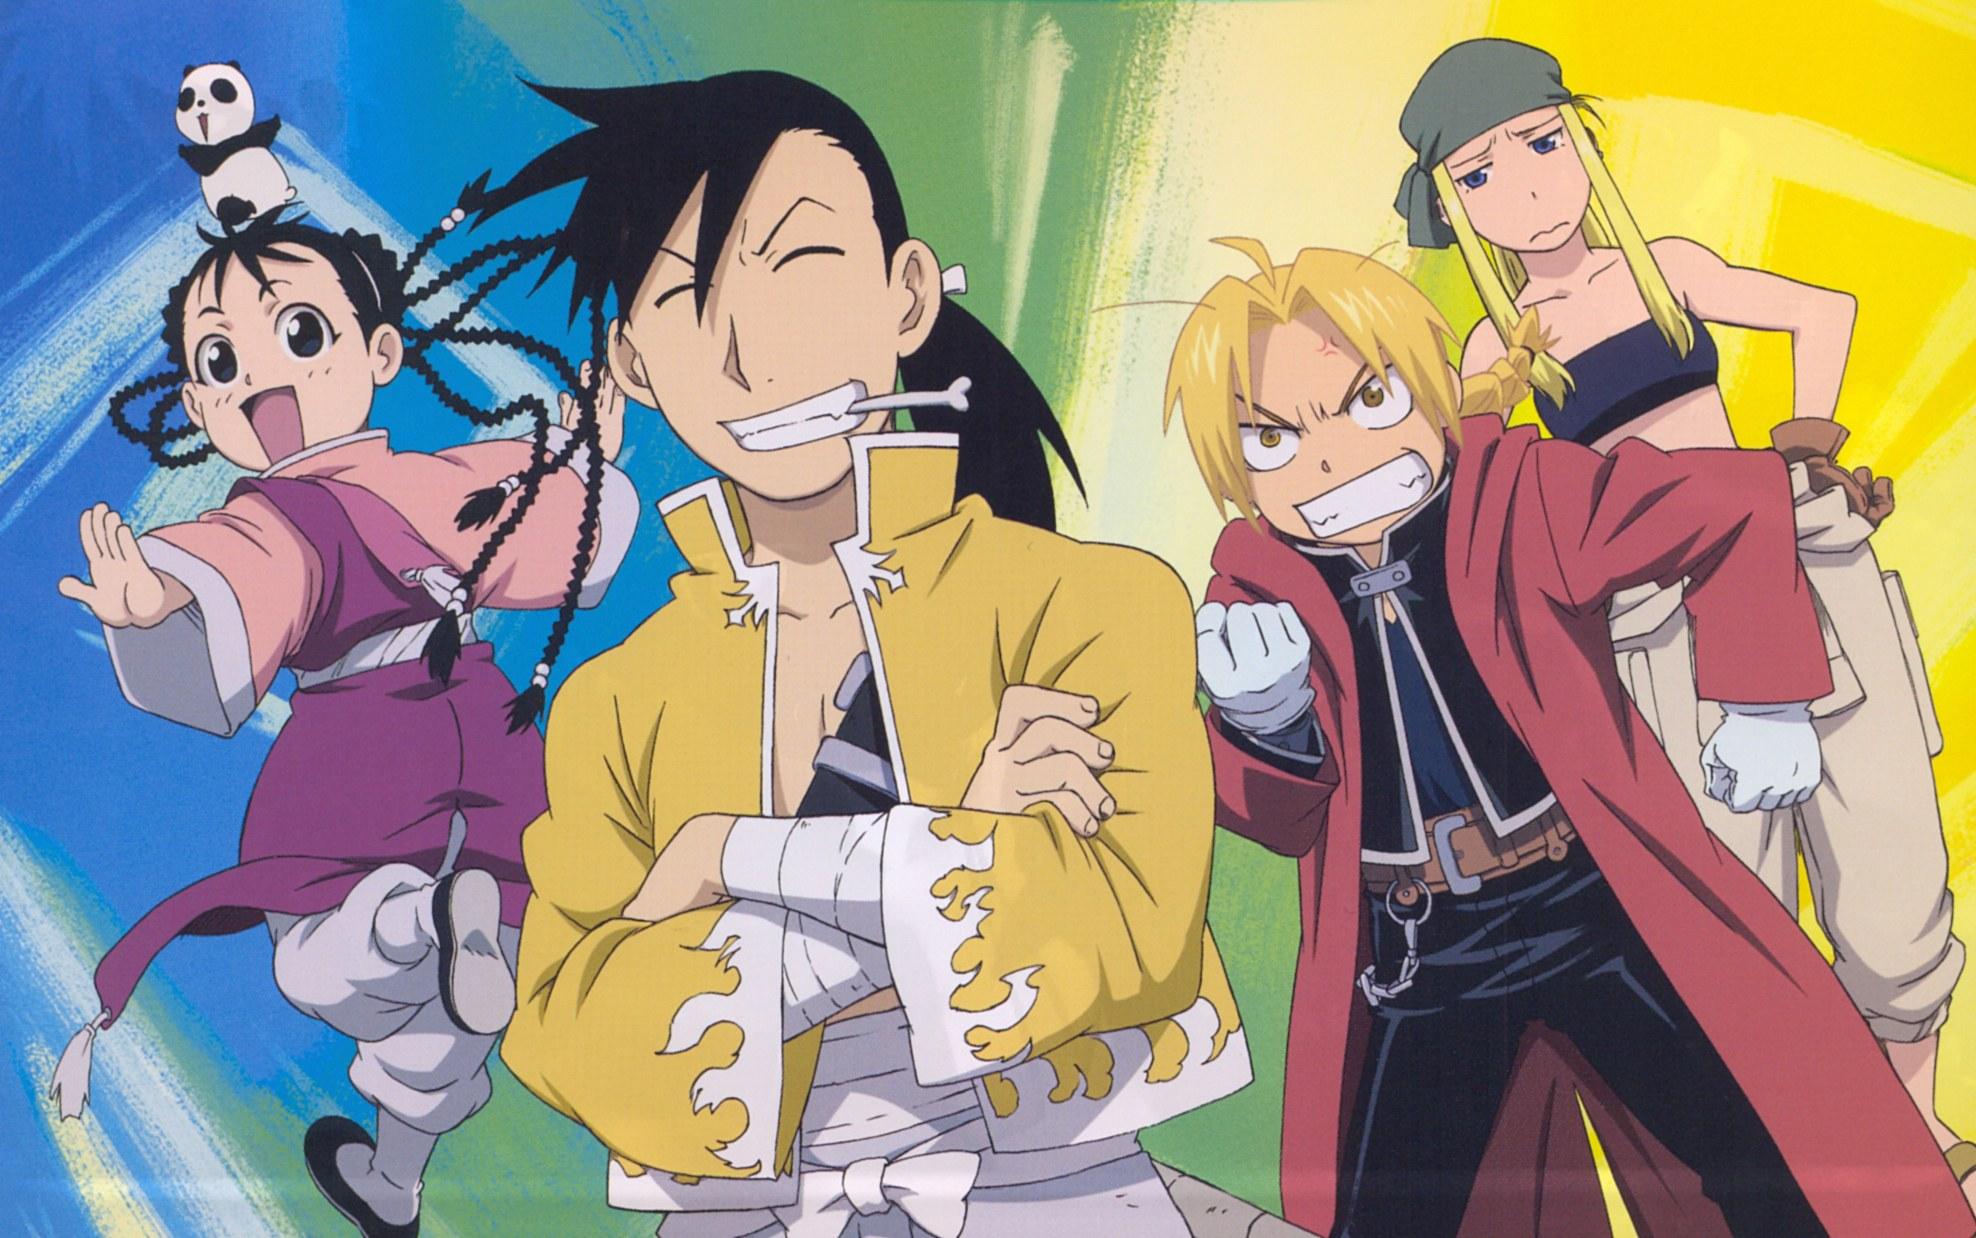 Fullmetal Alchemist Brotherhood Image #639240 - Zerochan Anime Image Board